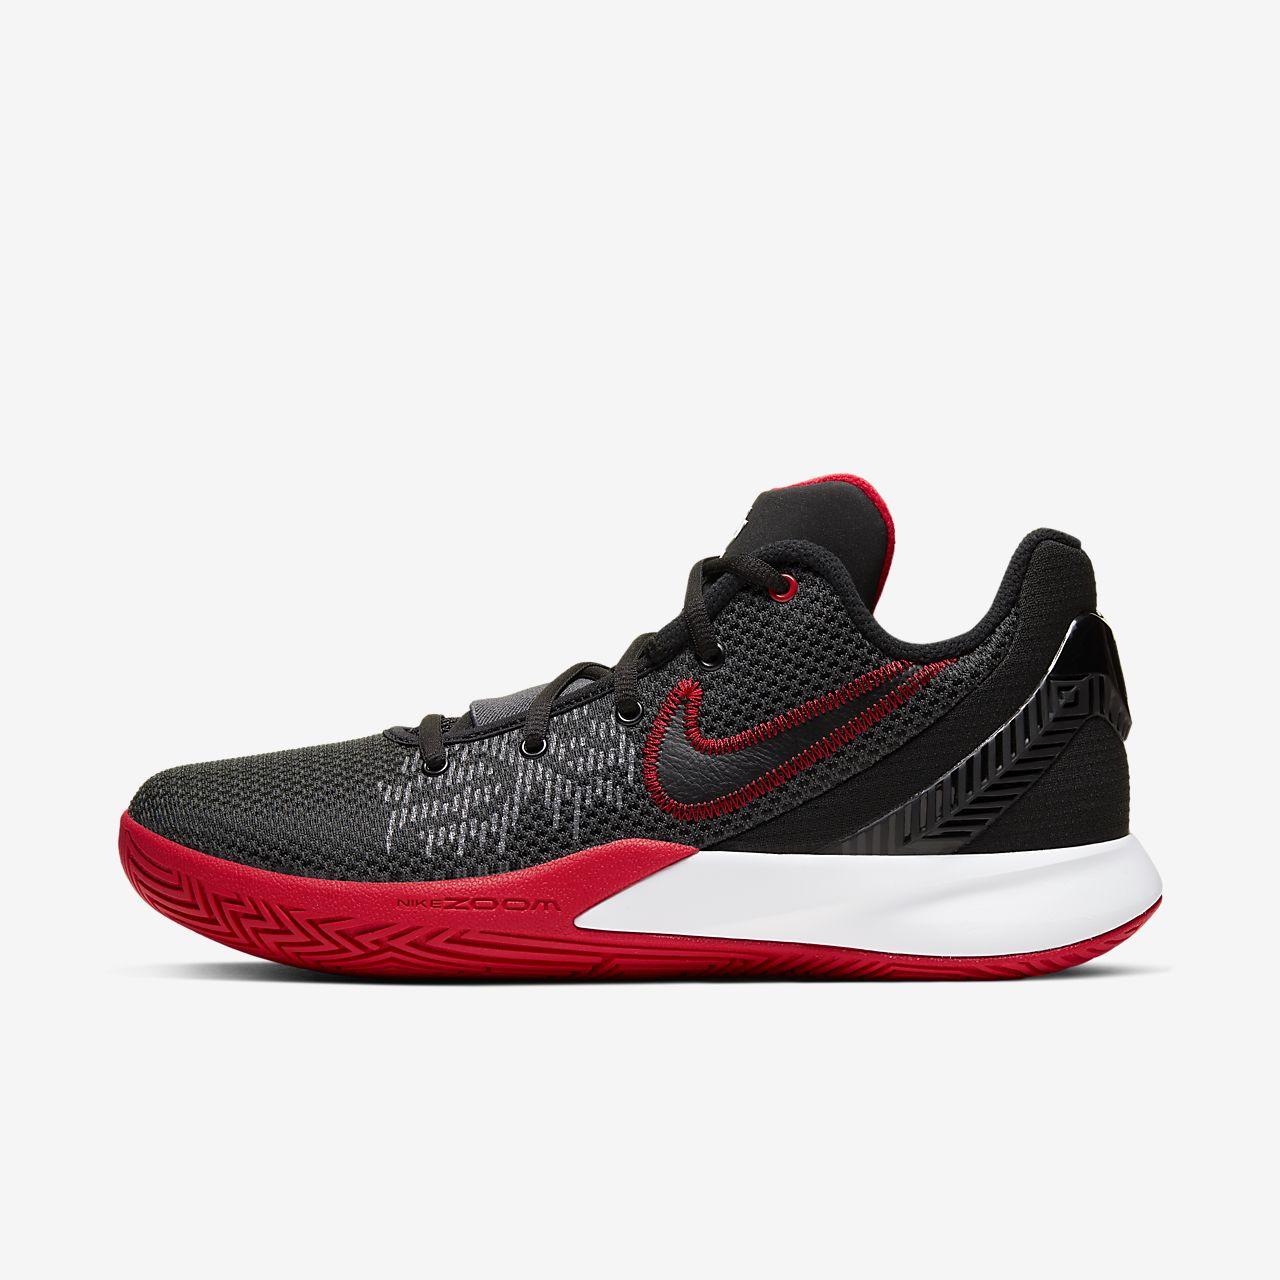 Kyrie Flytrap II EP 籃球鞋